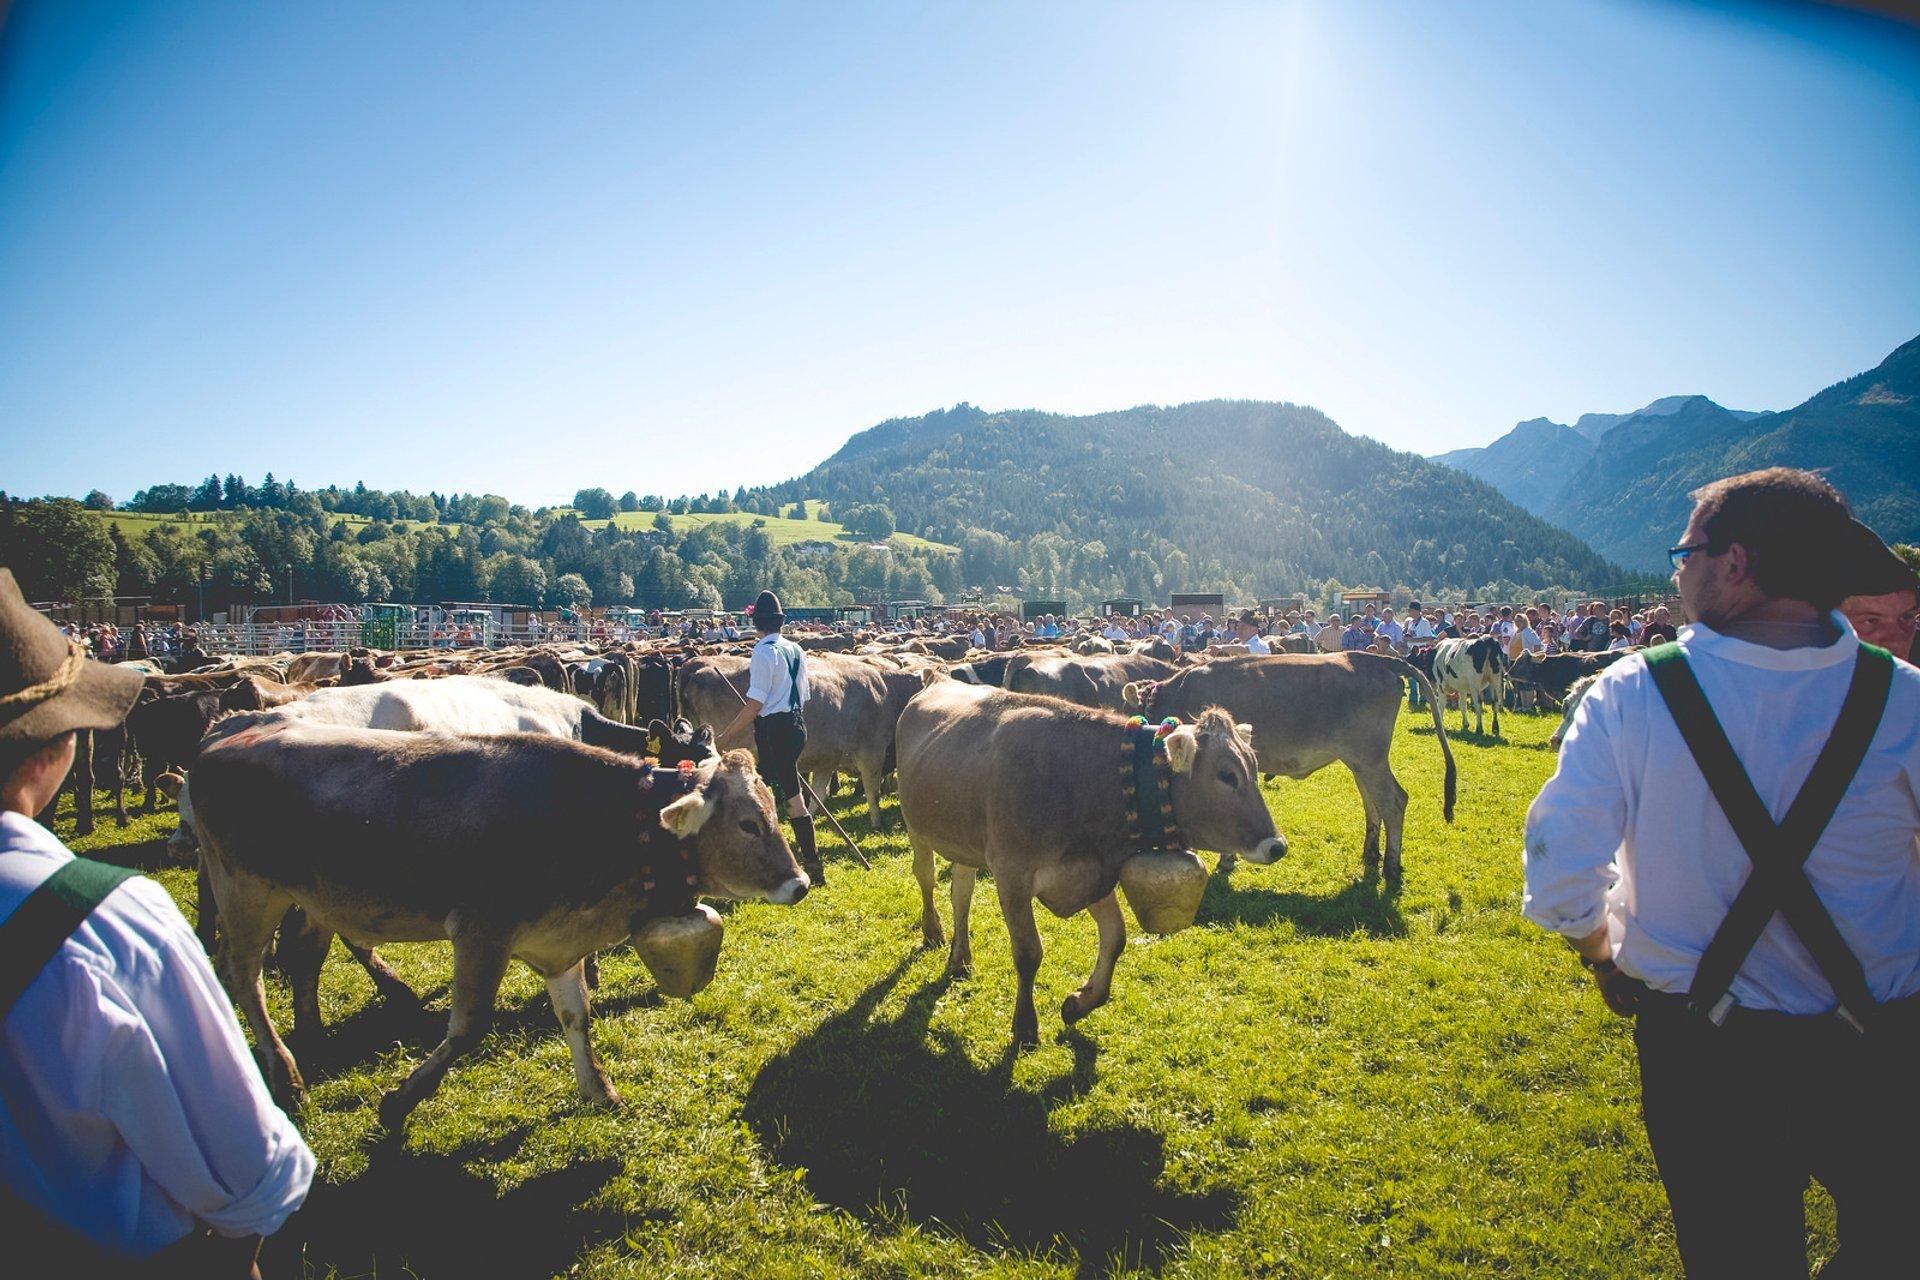 Best time to see Viehscheid in Bavaria 2020